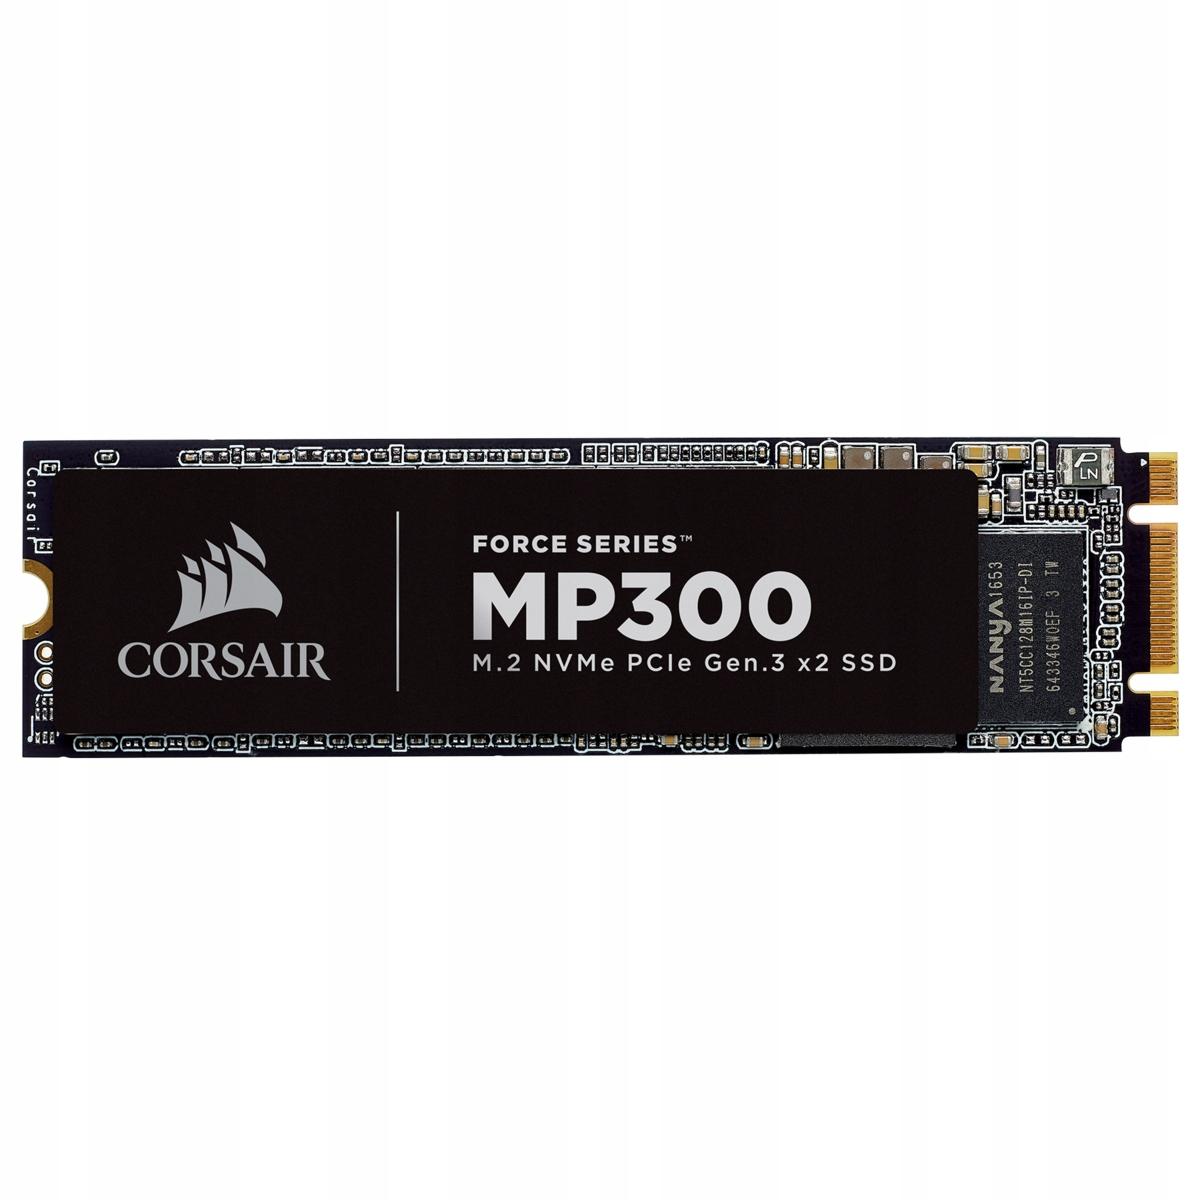 CORSAIR FORCE MP300 240 GB DYSK SSD M.2 2280 PCIe